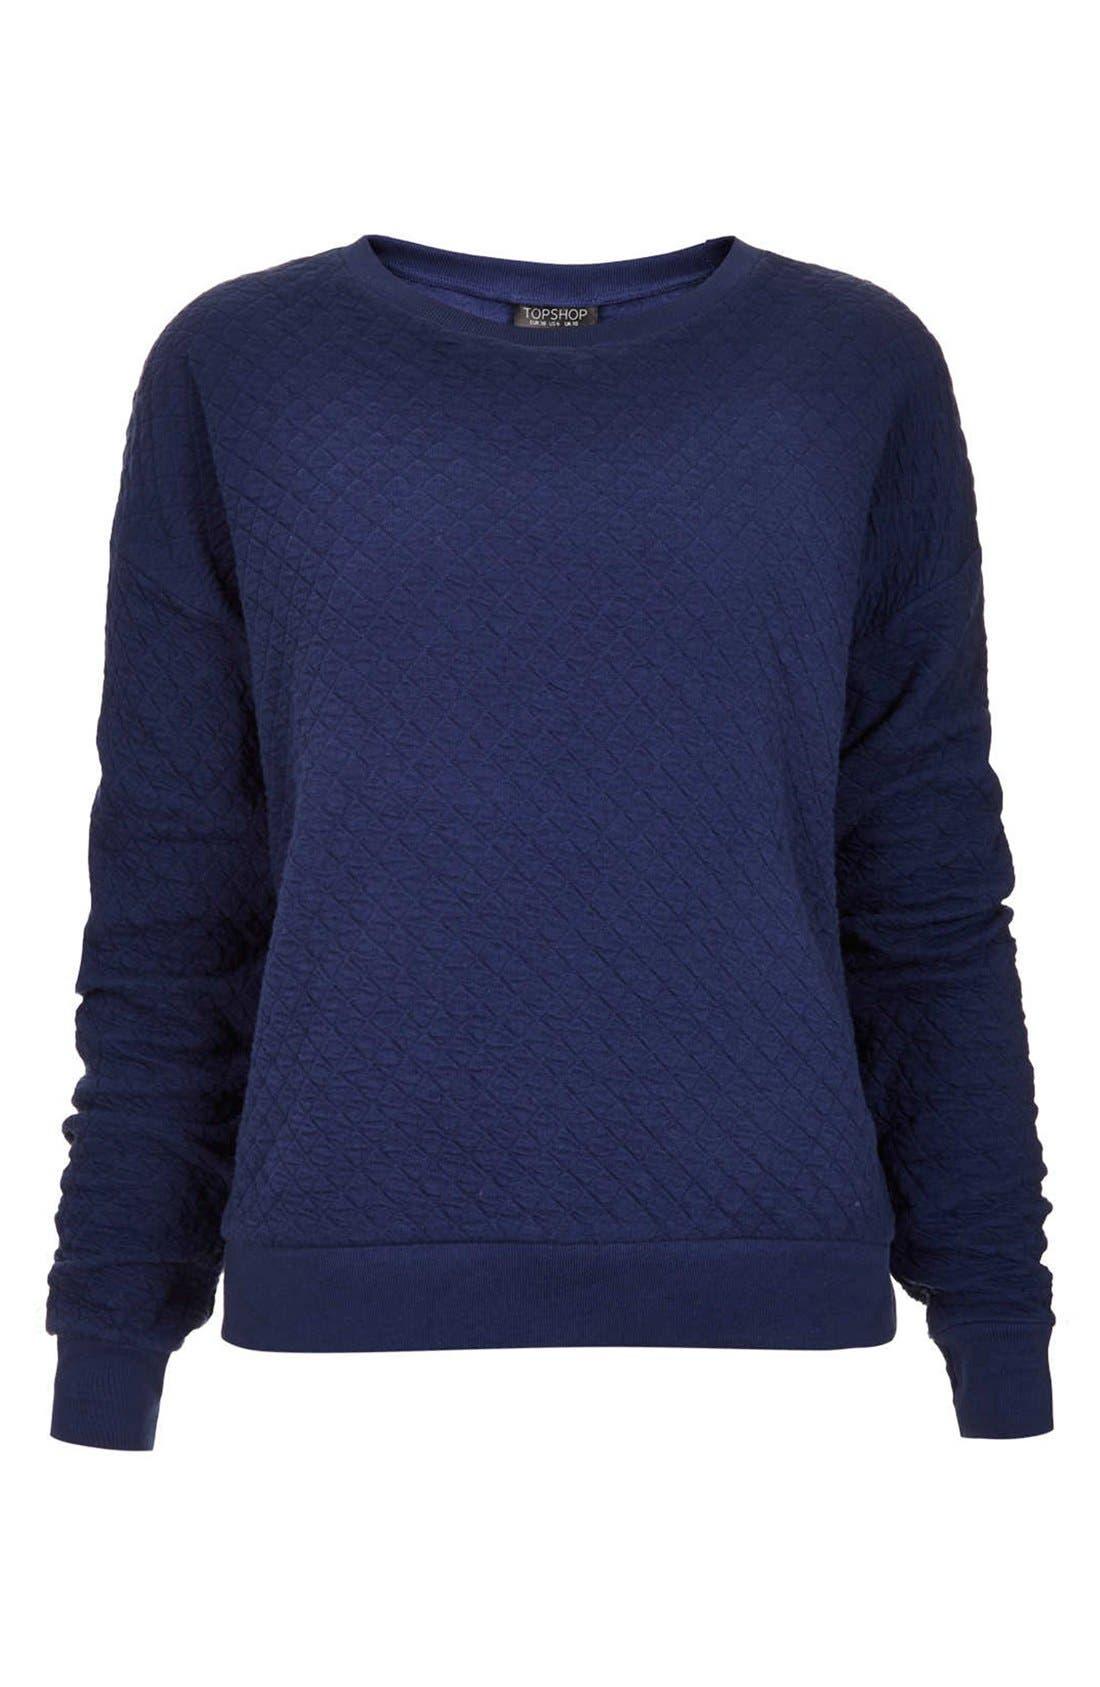 Alternate Image 3  - Topshop Quilted Sweatshirt